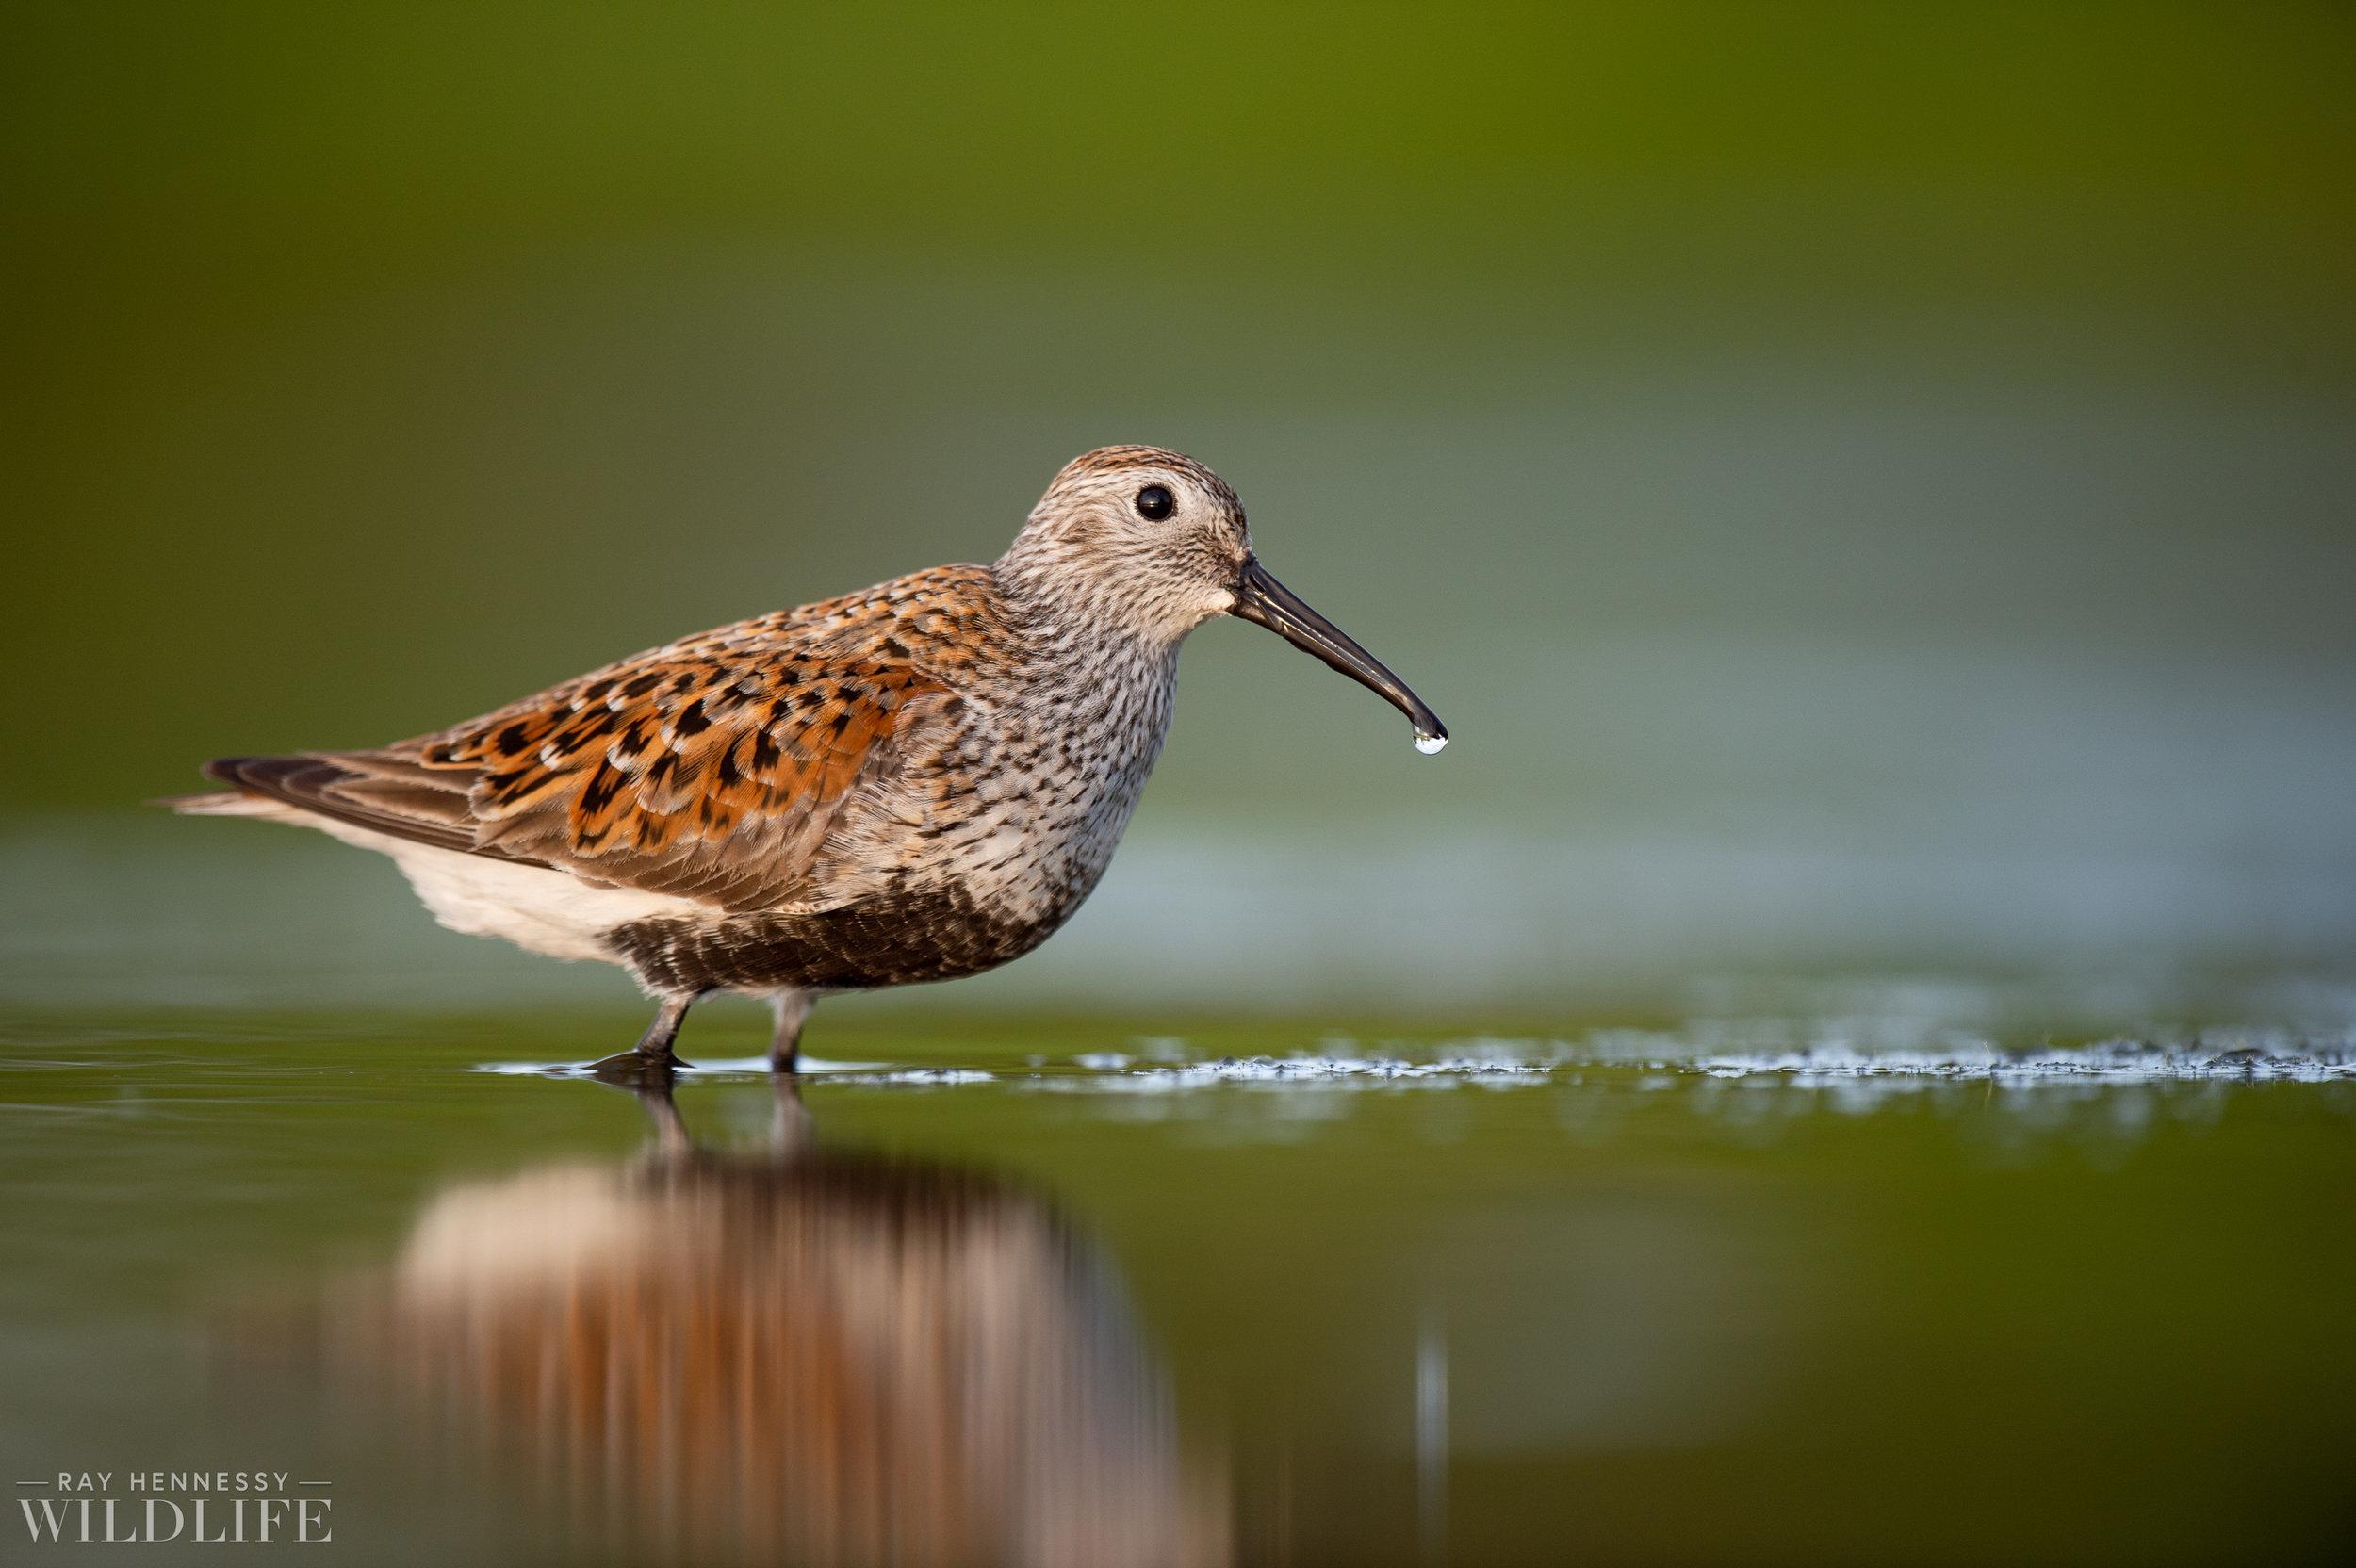 012_shorebirds-prothonotary-warbler.jpg